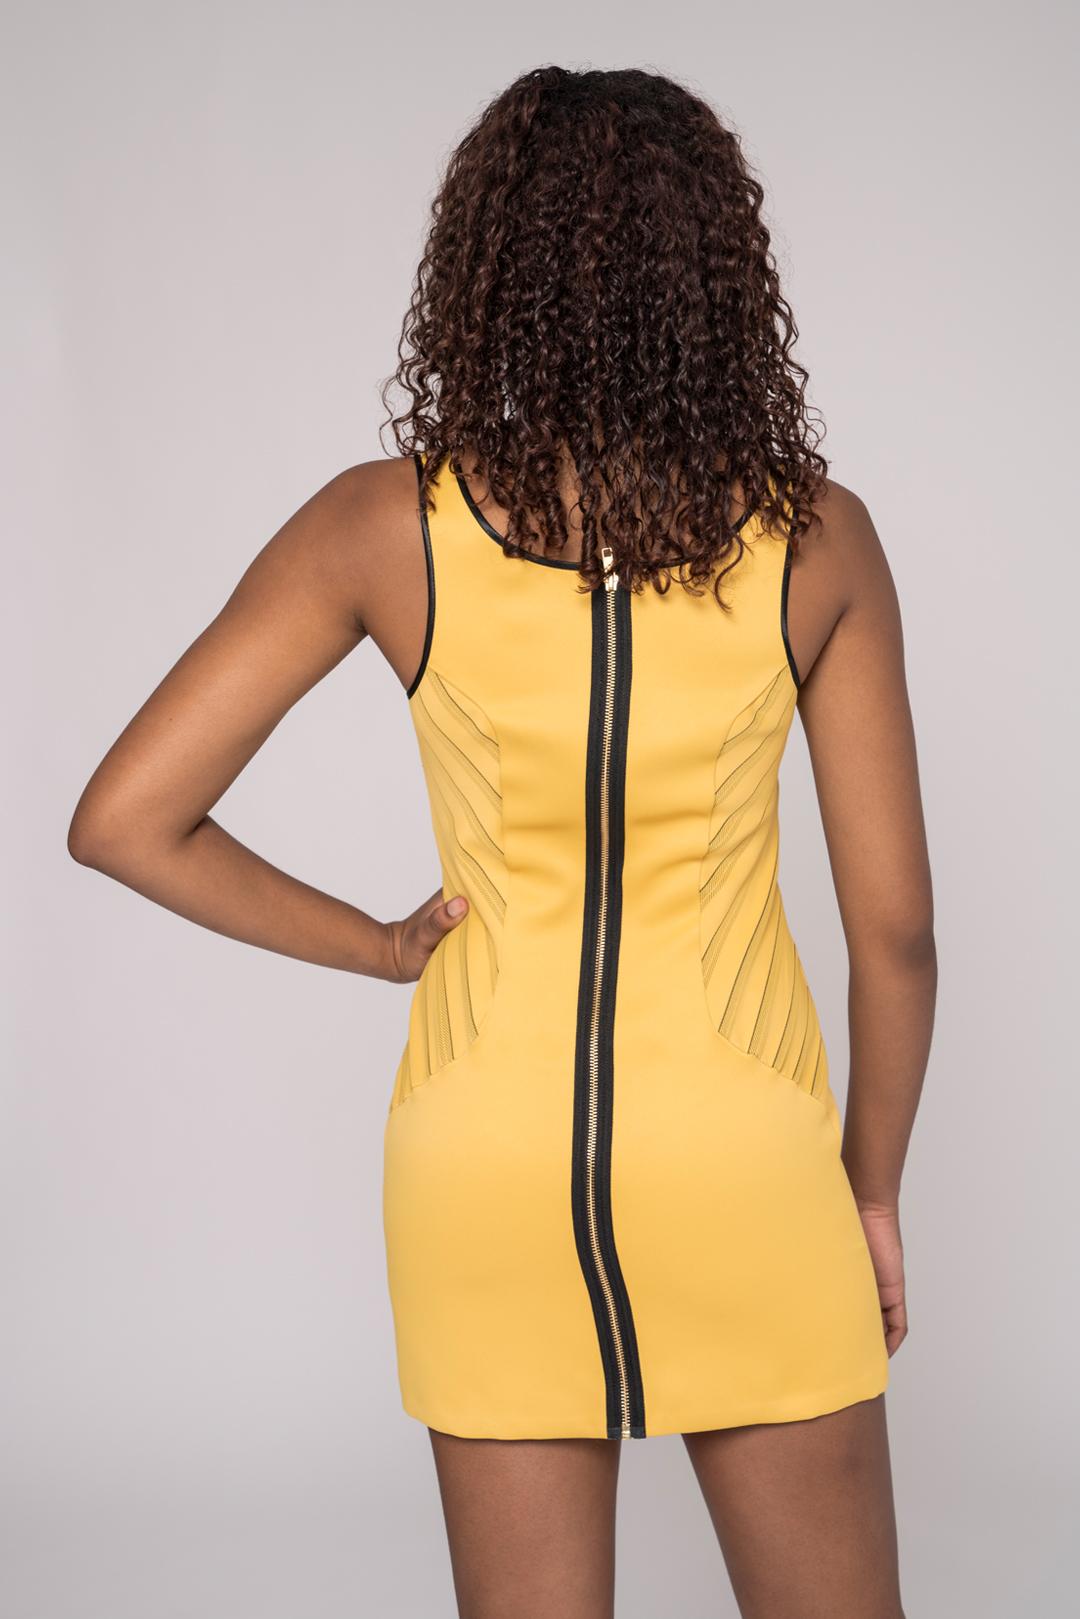 back view of a black model wearing a yellow sheath dress